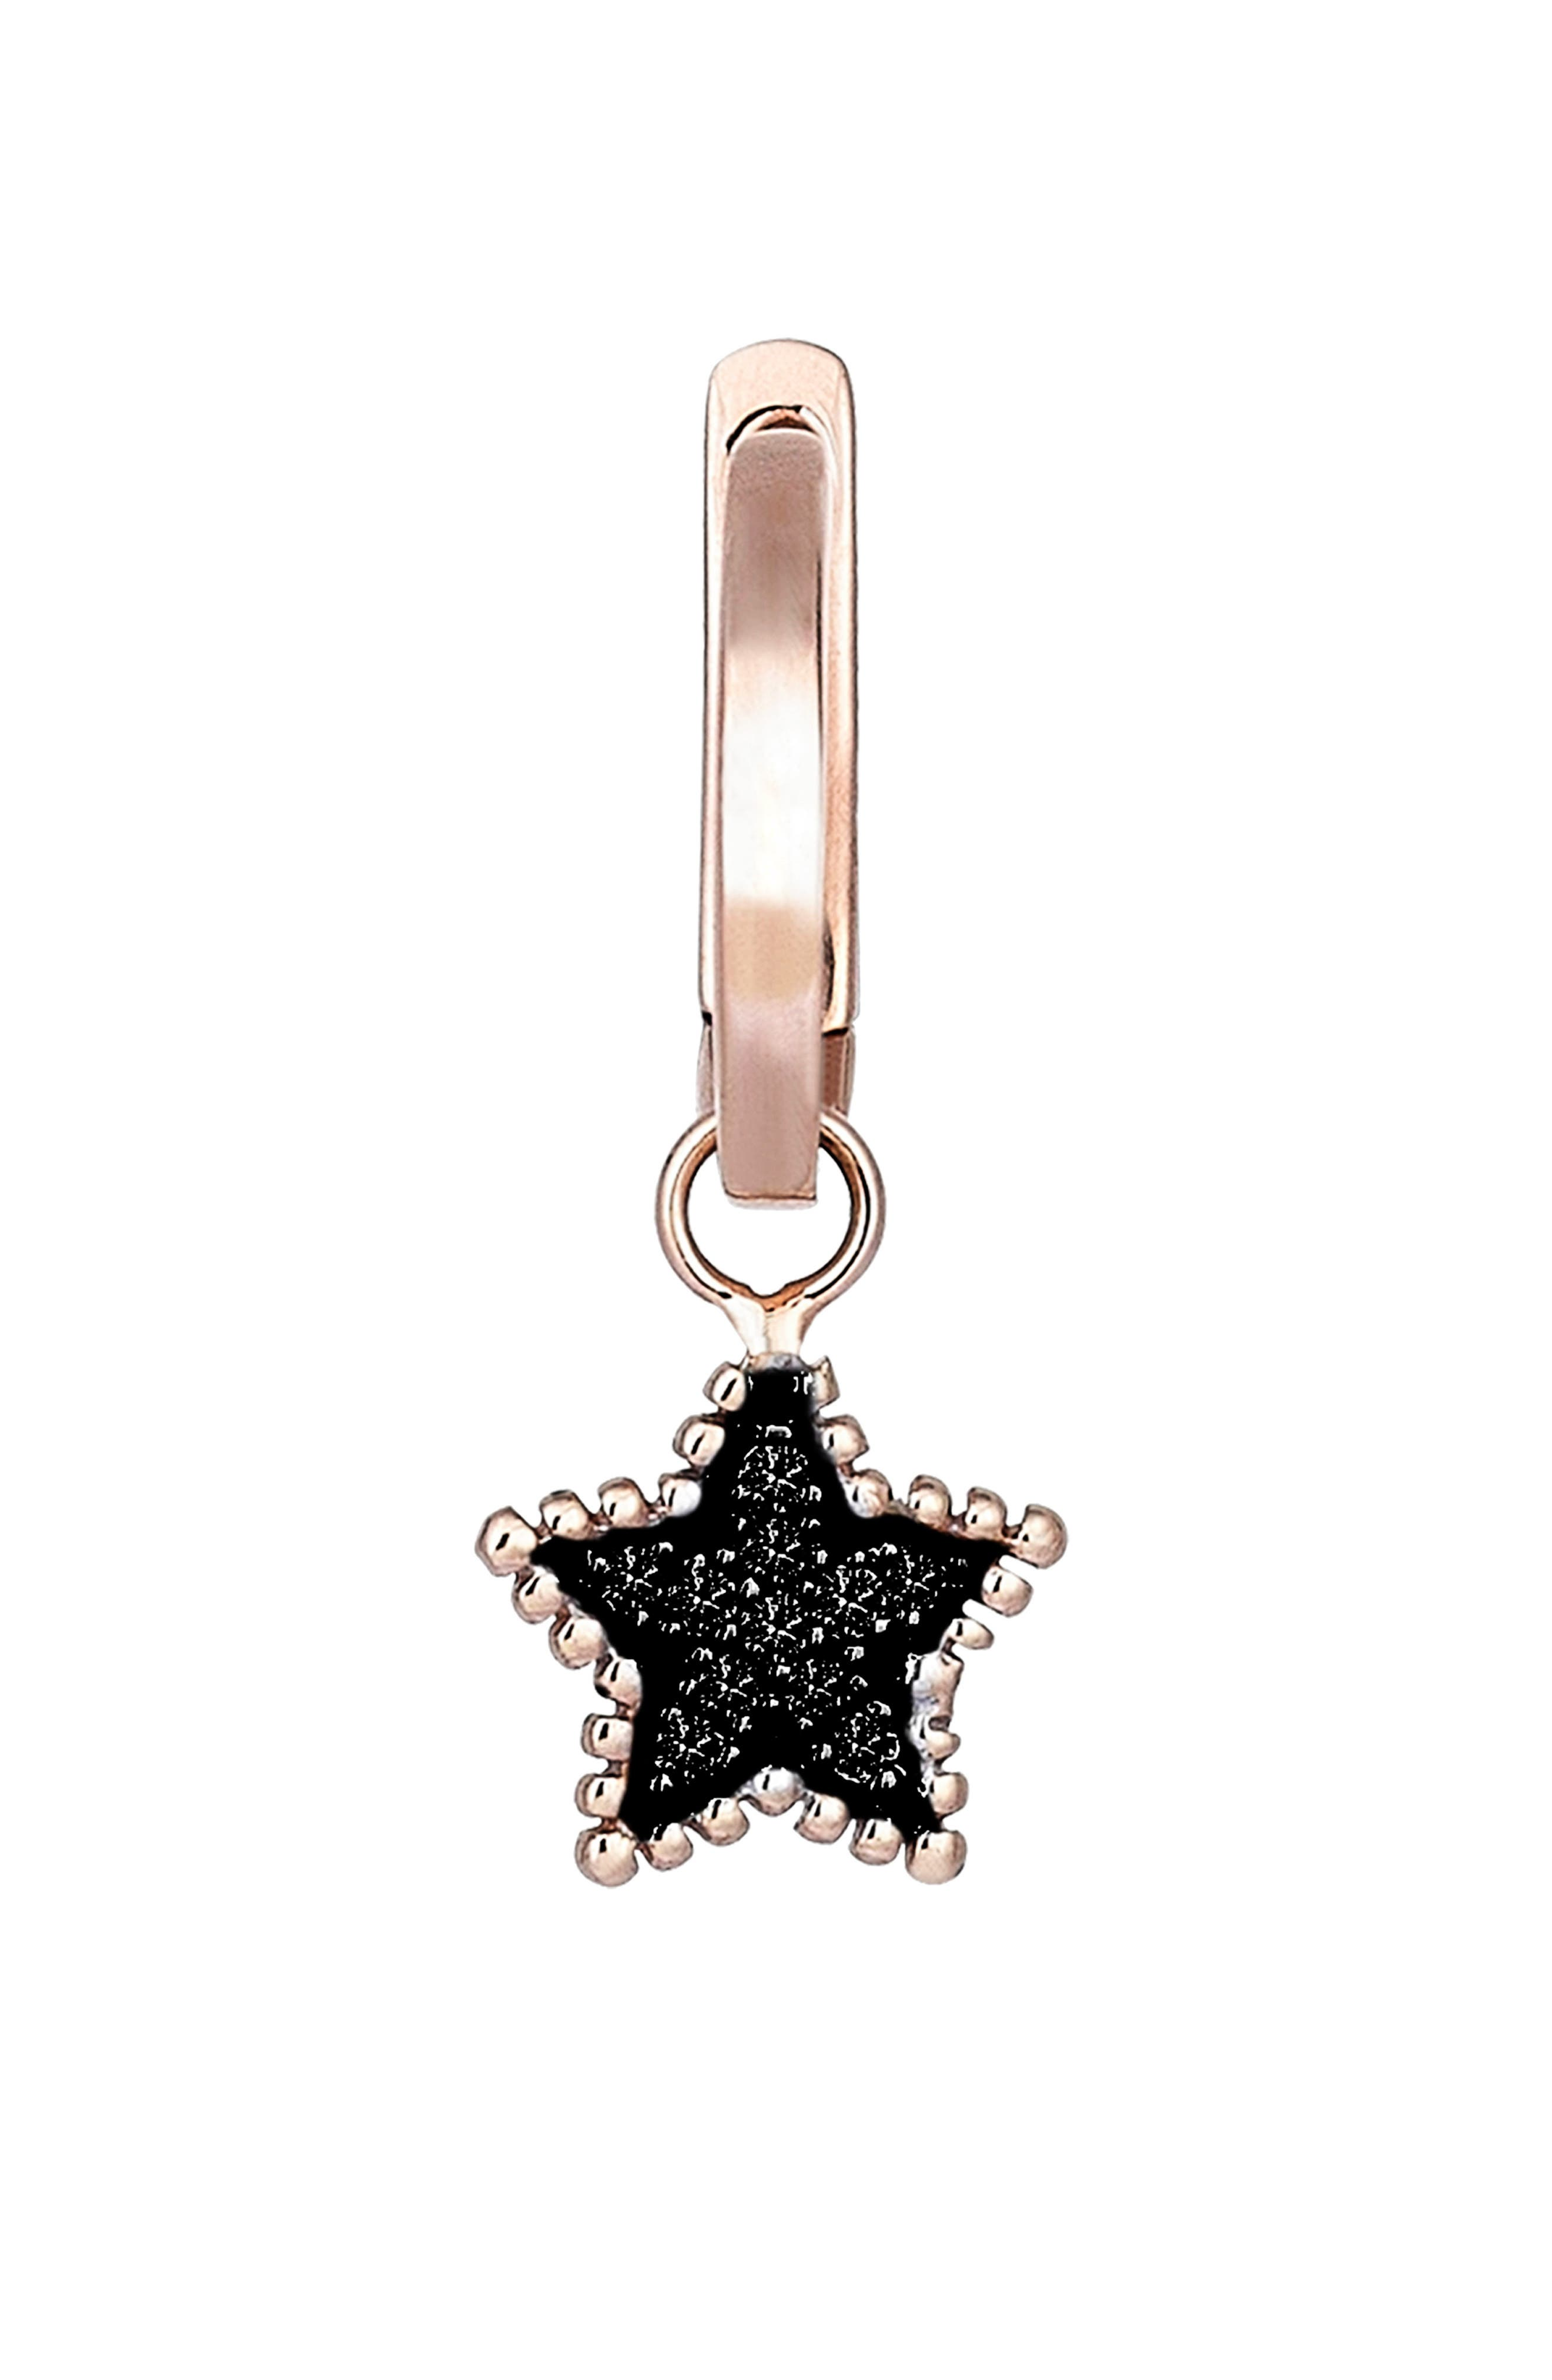 KISMET BY MILKA, Black Diamond Star Hoop Earring, Main thumbnail 1, color, ROSE GOLD